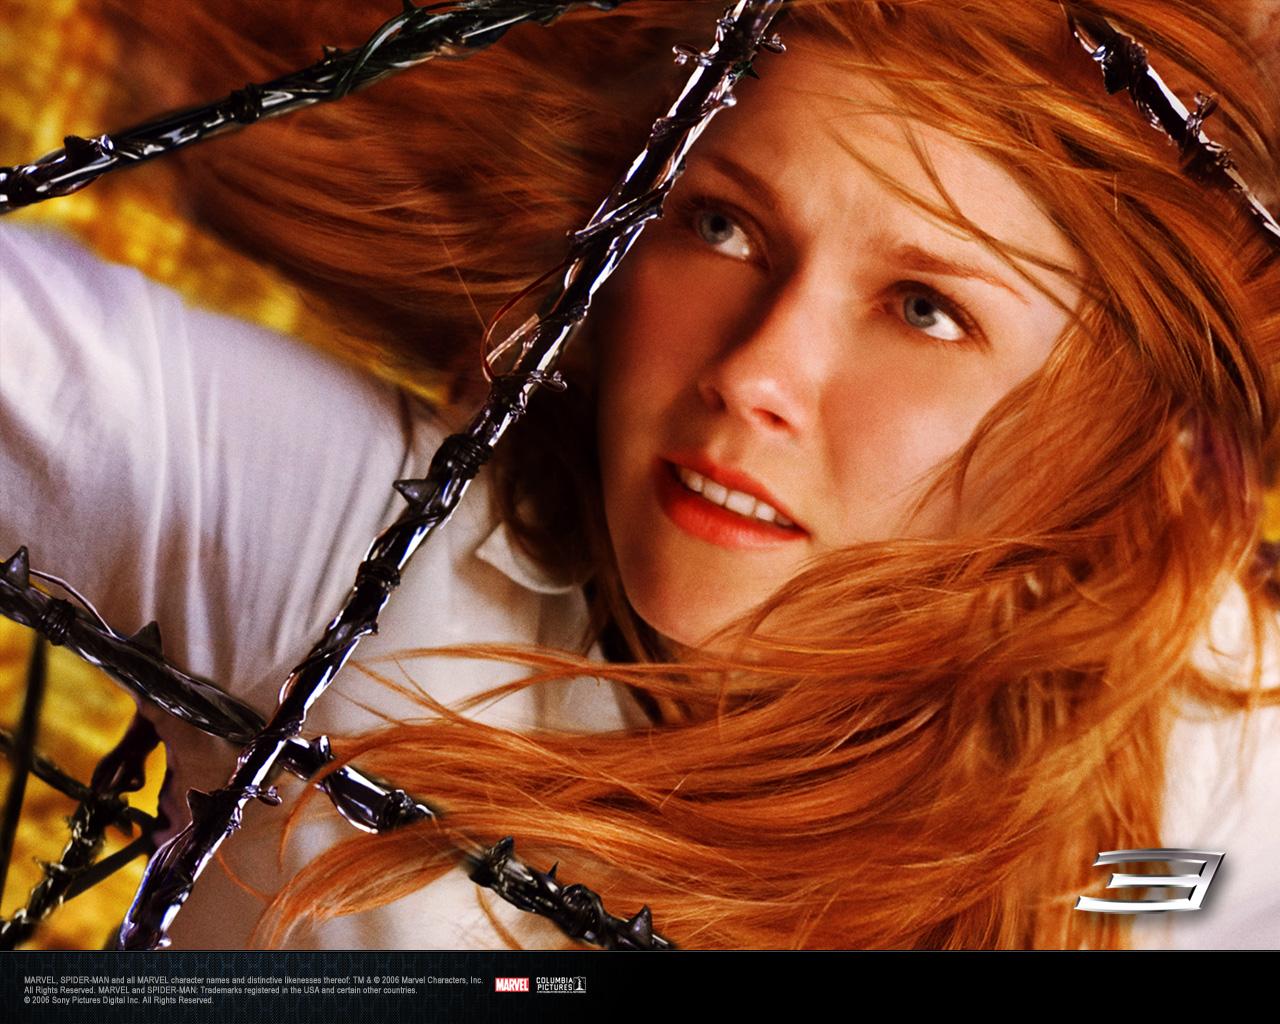 Spiderman actress - photo#11